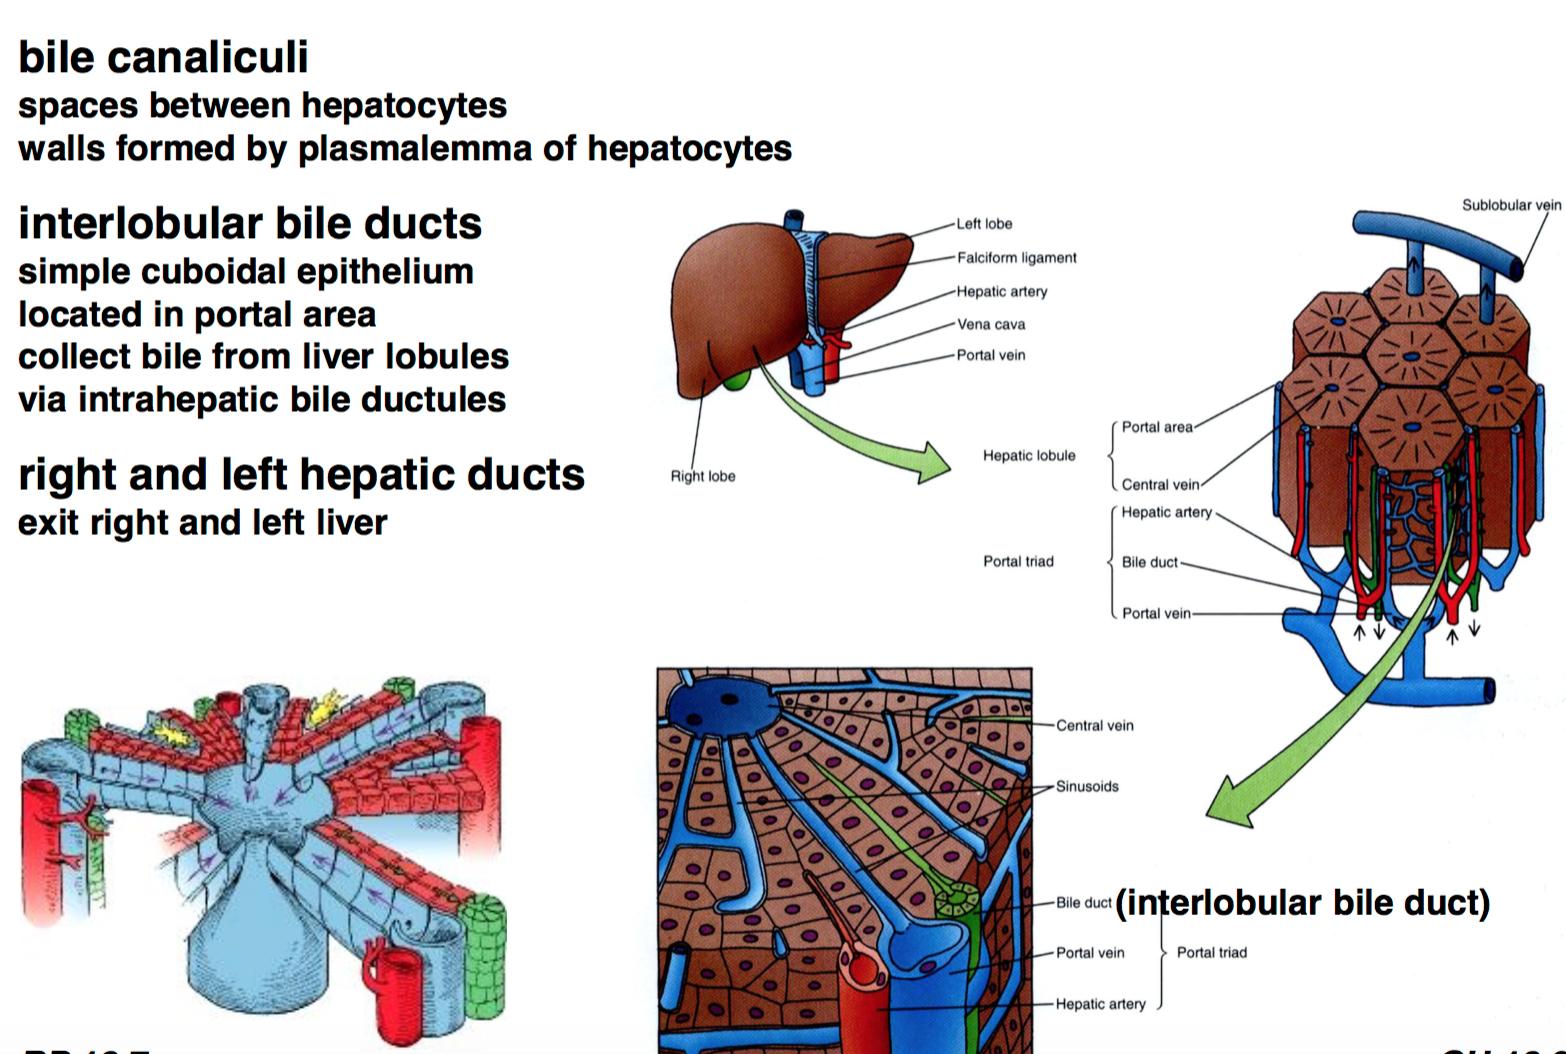 Gs He 34 35 Liver Gallbladder Pancreas Histology Unit 4 Flashcards